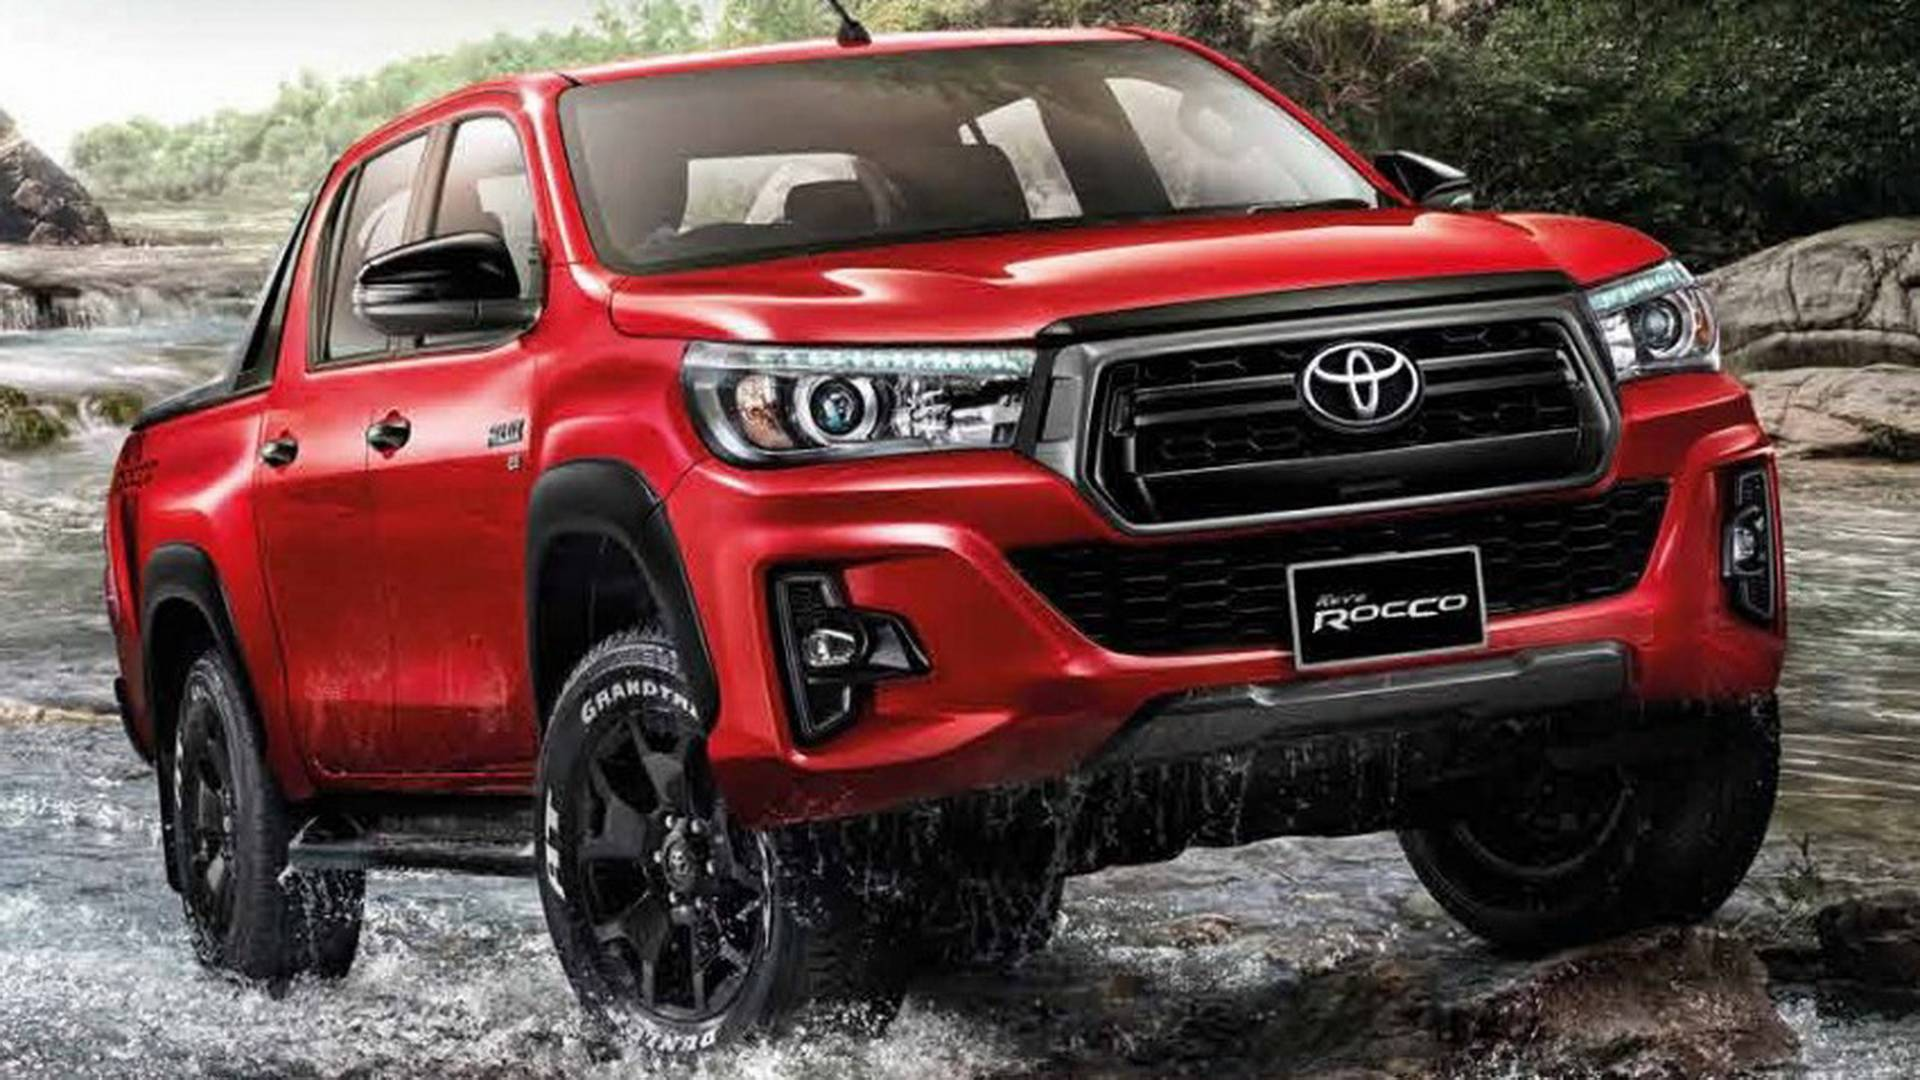 Kelebihan Toyota Hilux 2018 Murah Berkualitas